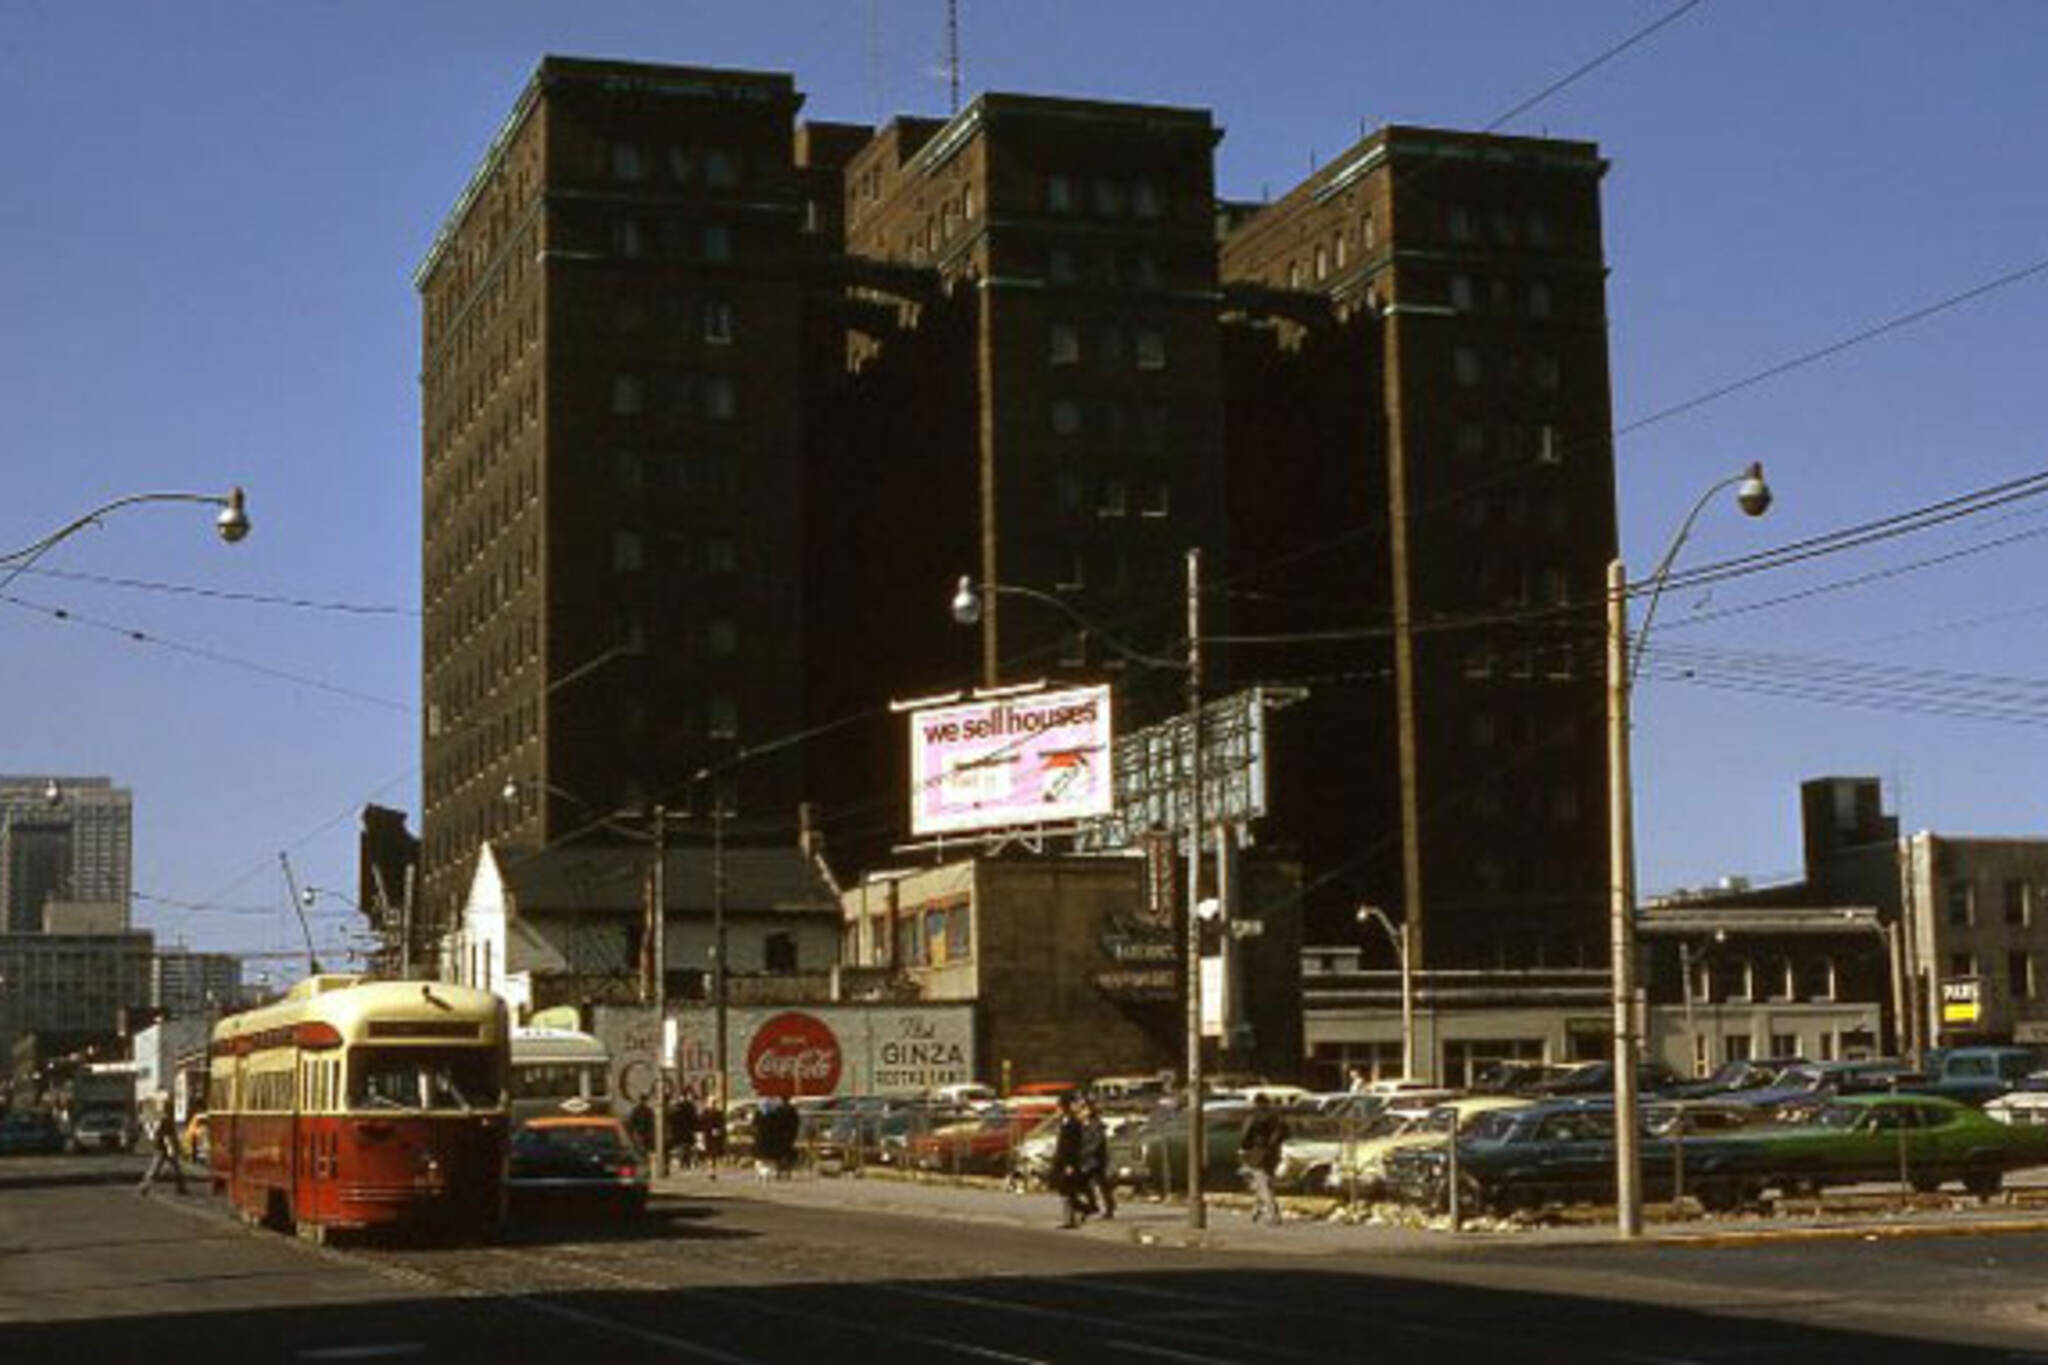 toronto ford hotel